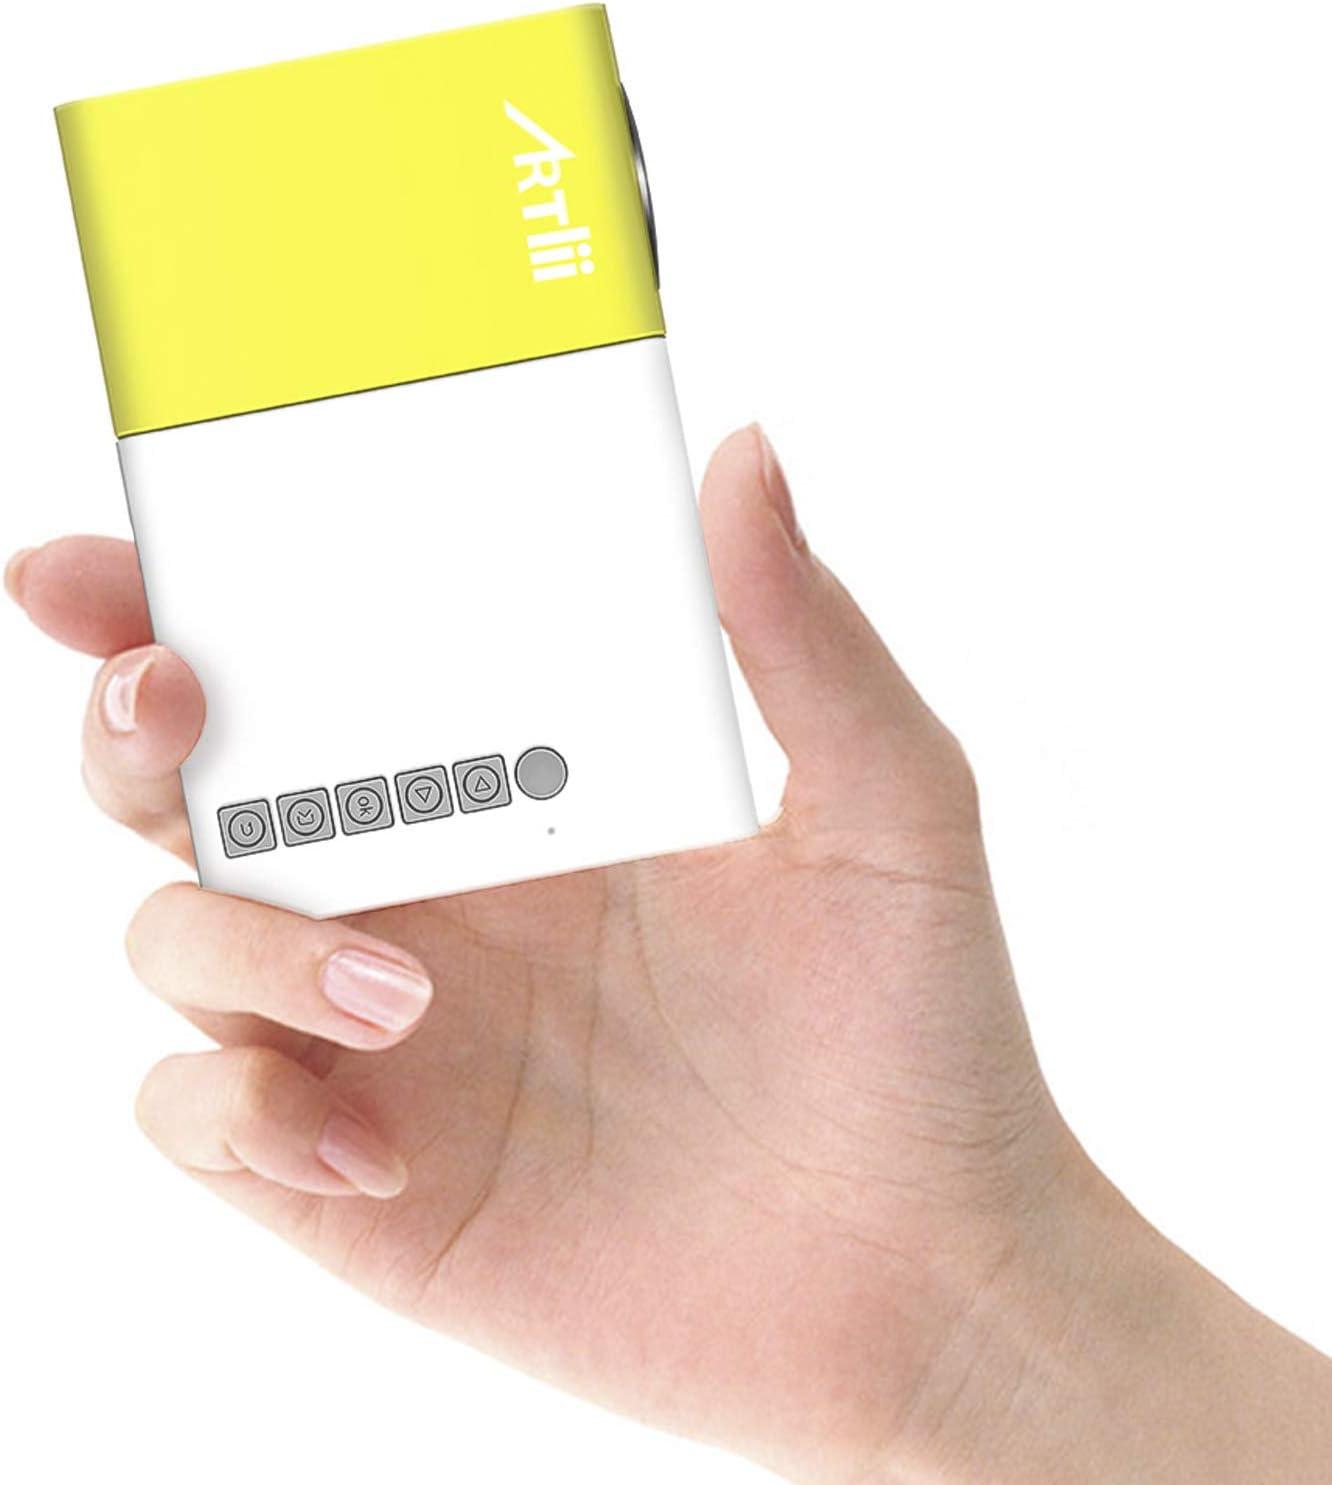 Mini Proyector Portátil - Artlii Proyector para Movil, Recargable, Compatible con USB/HDMI/SD/AV, Regalo Infantil